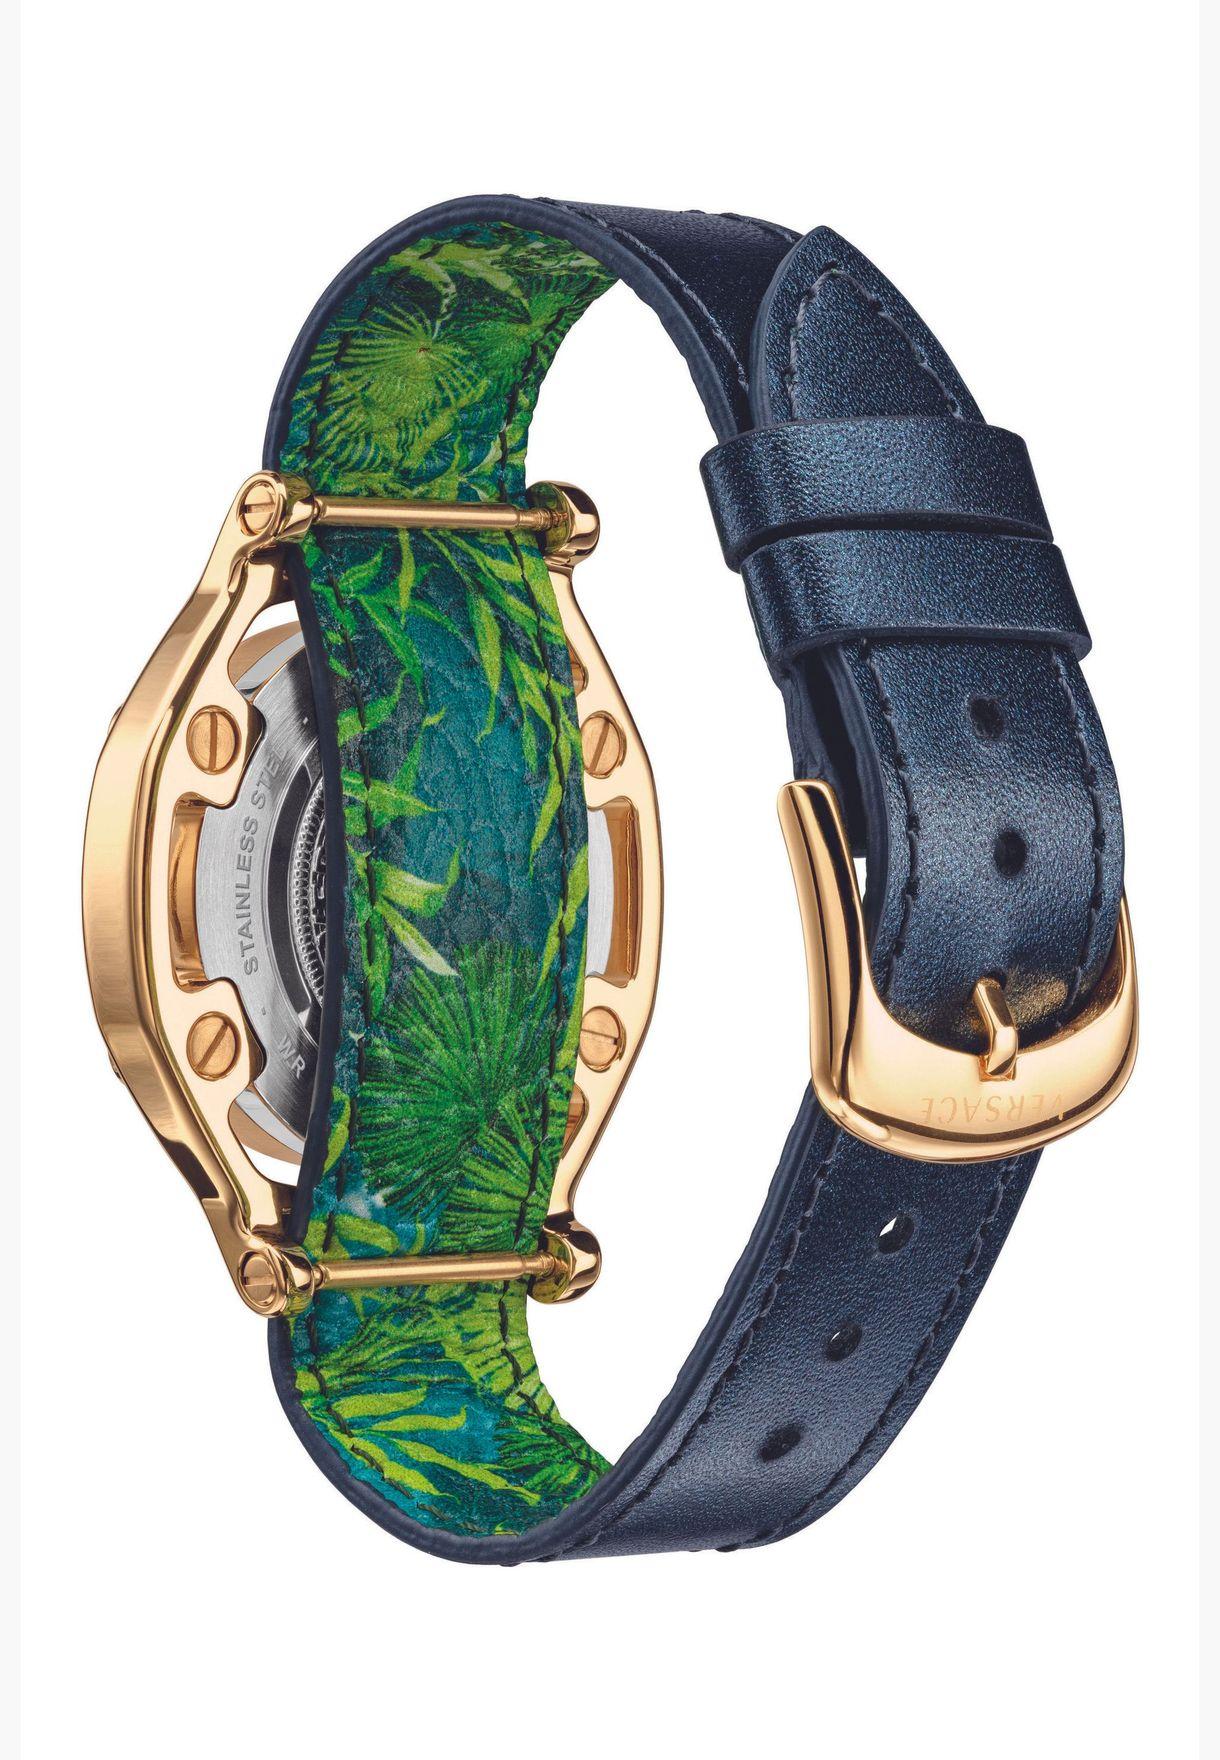 Versace MEDUSA FRAME leather Watch for Women - VEVF00820